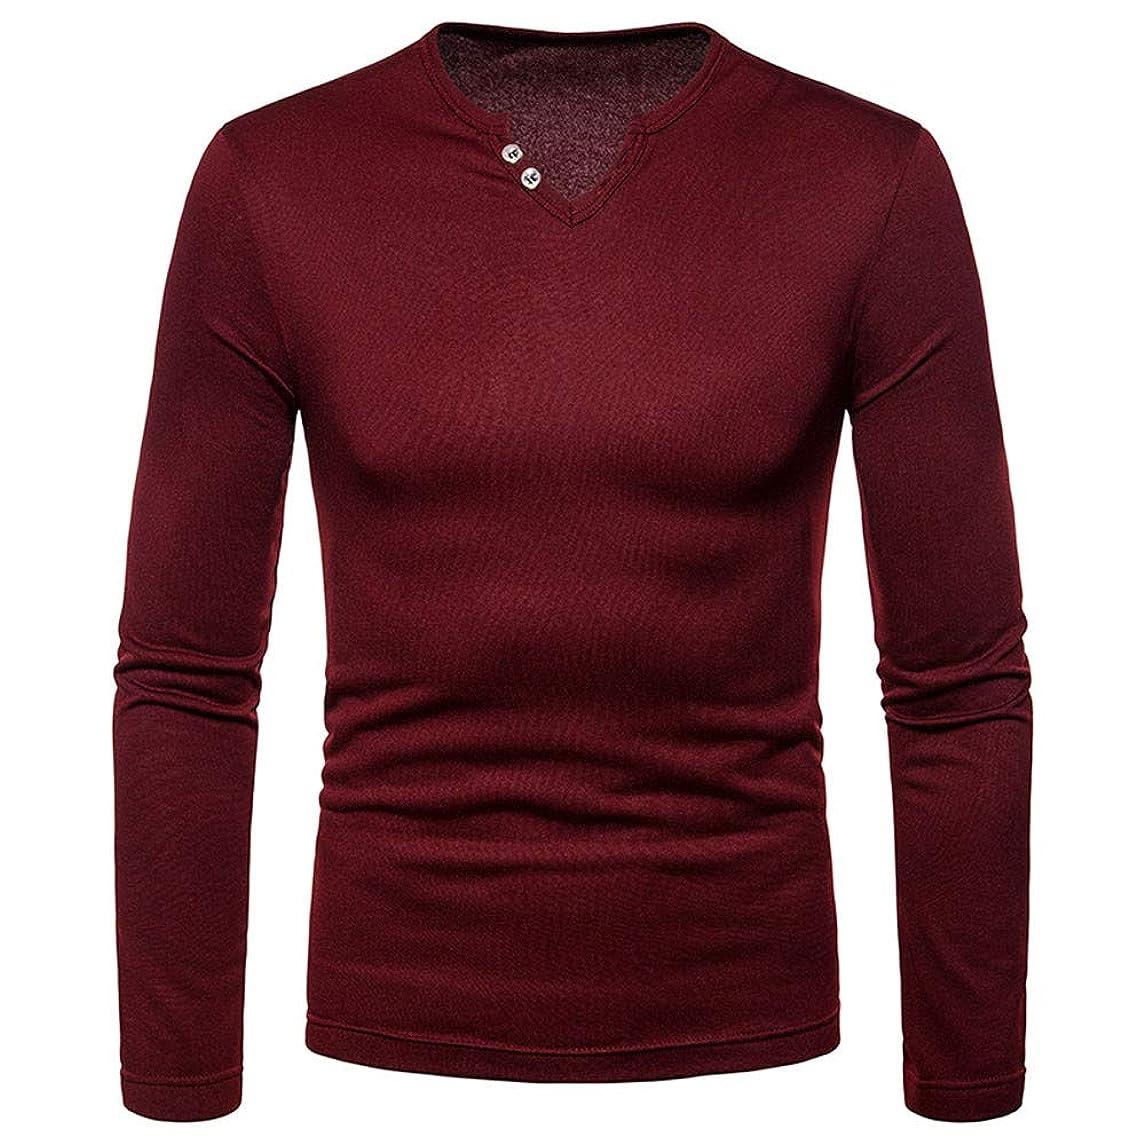 iLXHD 2018 Mens Casual Sweartshirts Solid Long Sleeve V-Neck T-Shirt Blouse Tee